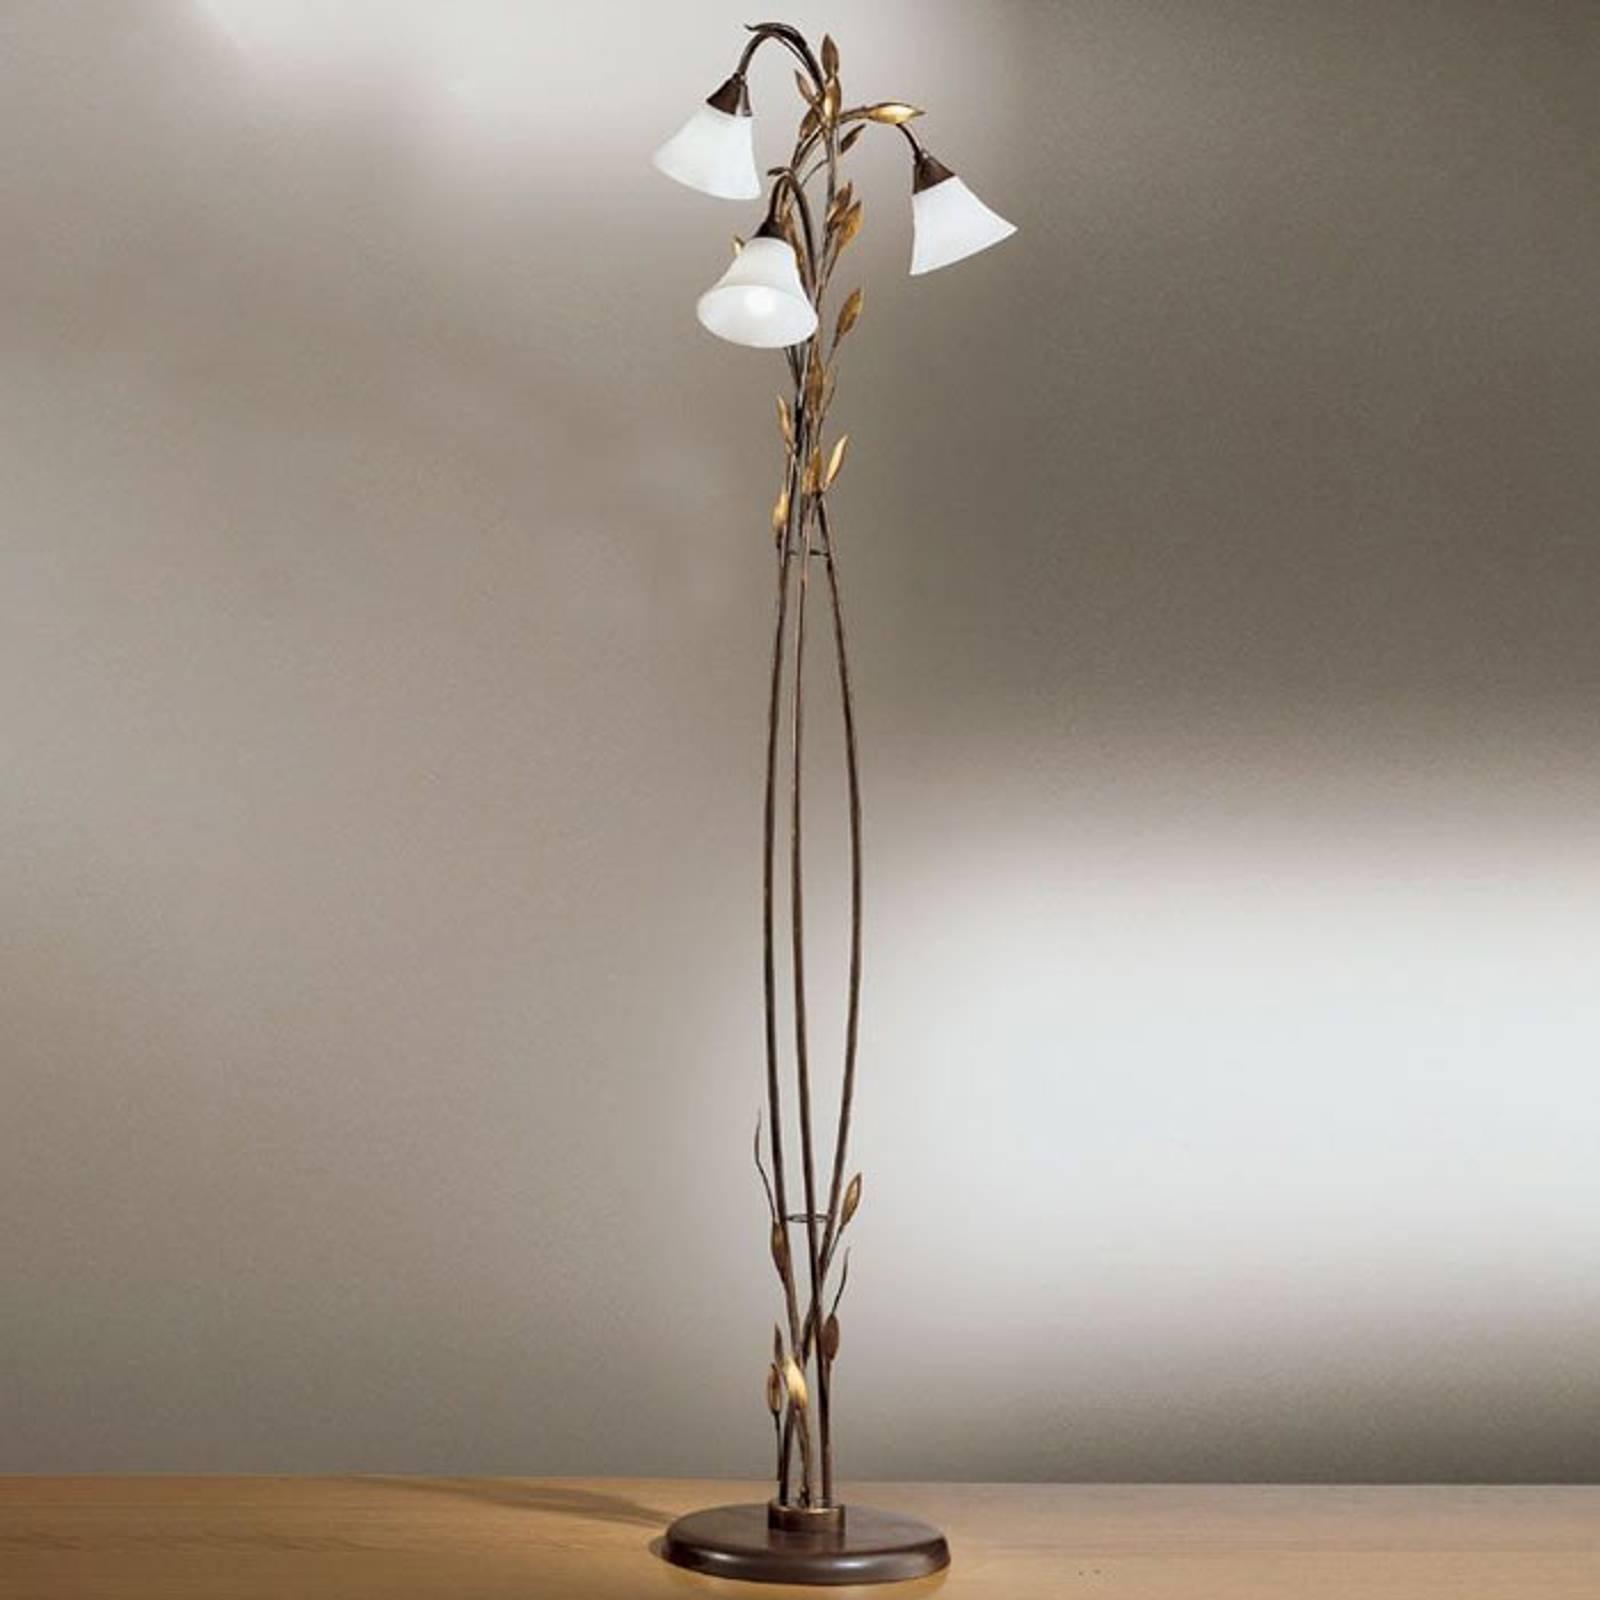 Vloerlamp CAMPANA, 3-lichts